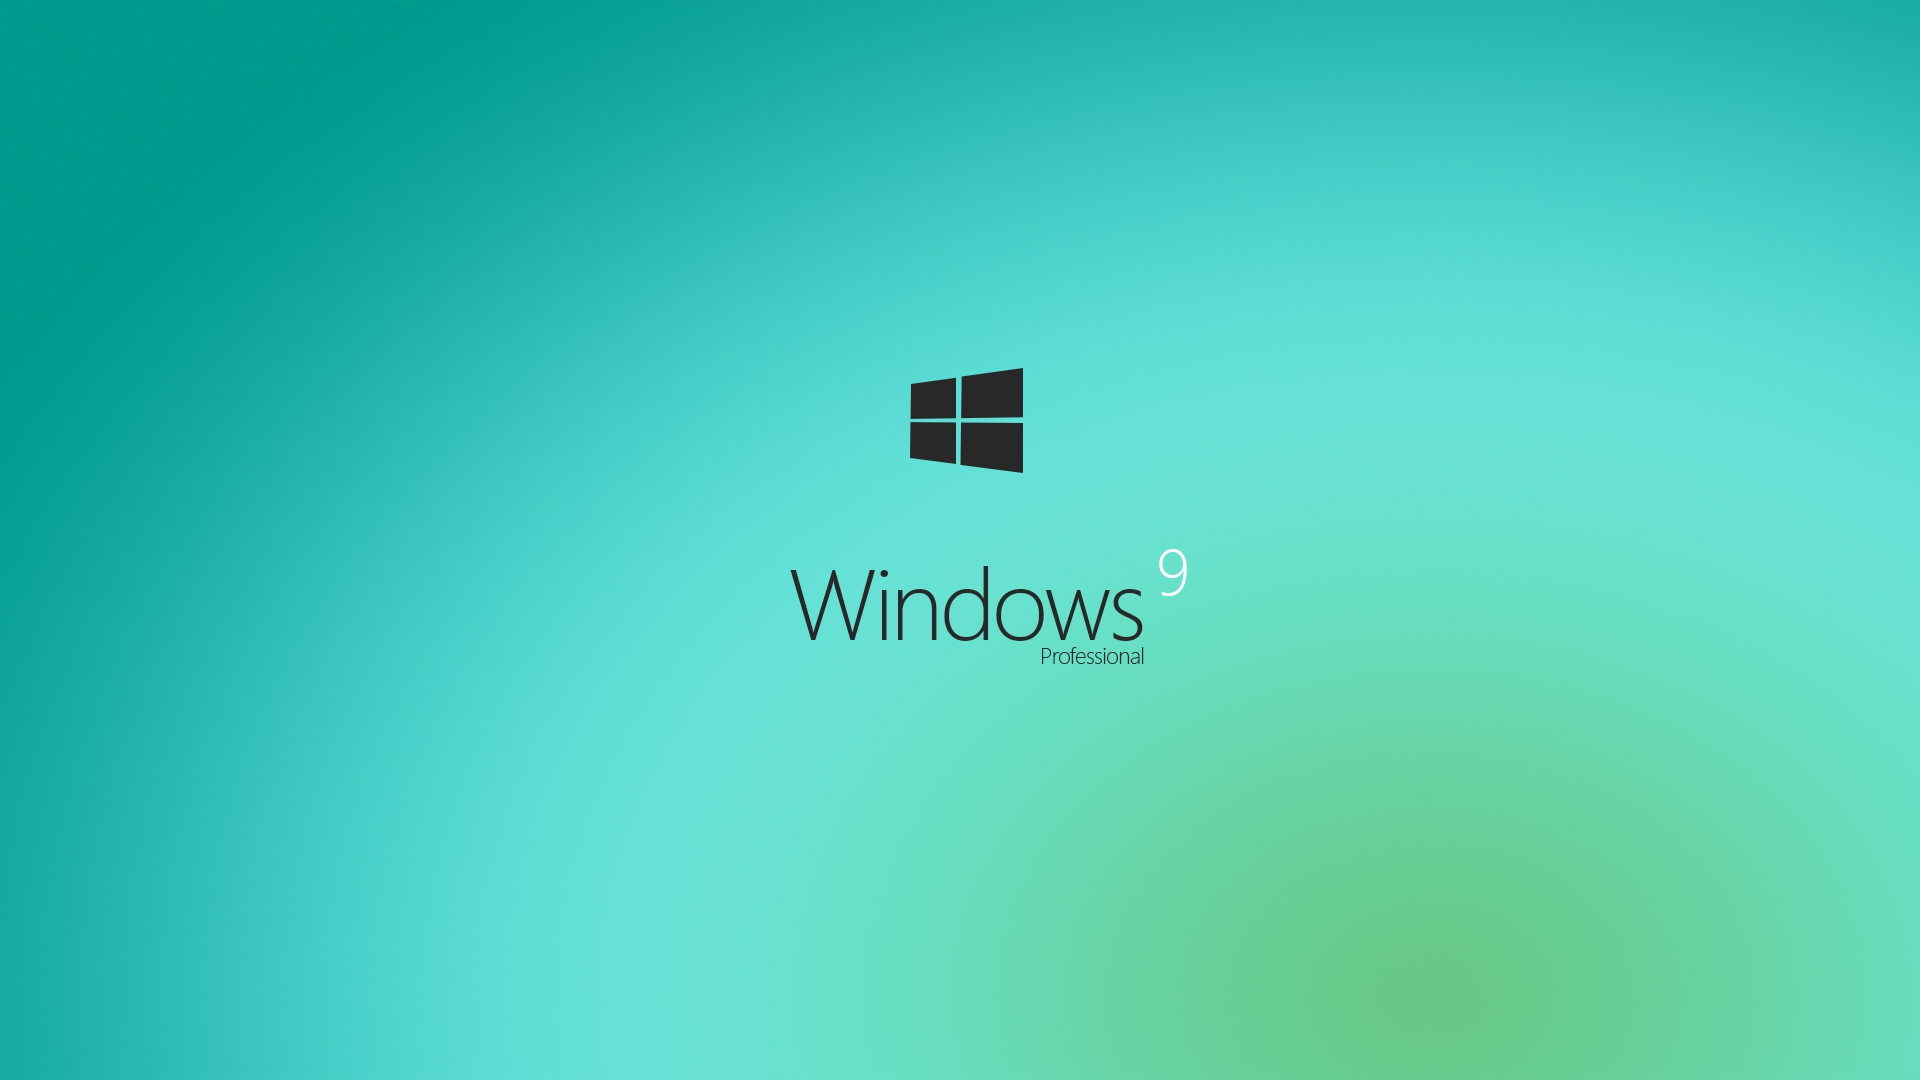 Nice wallpapers Windows 9 1920x1080px